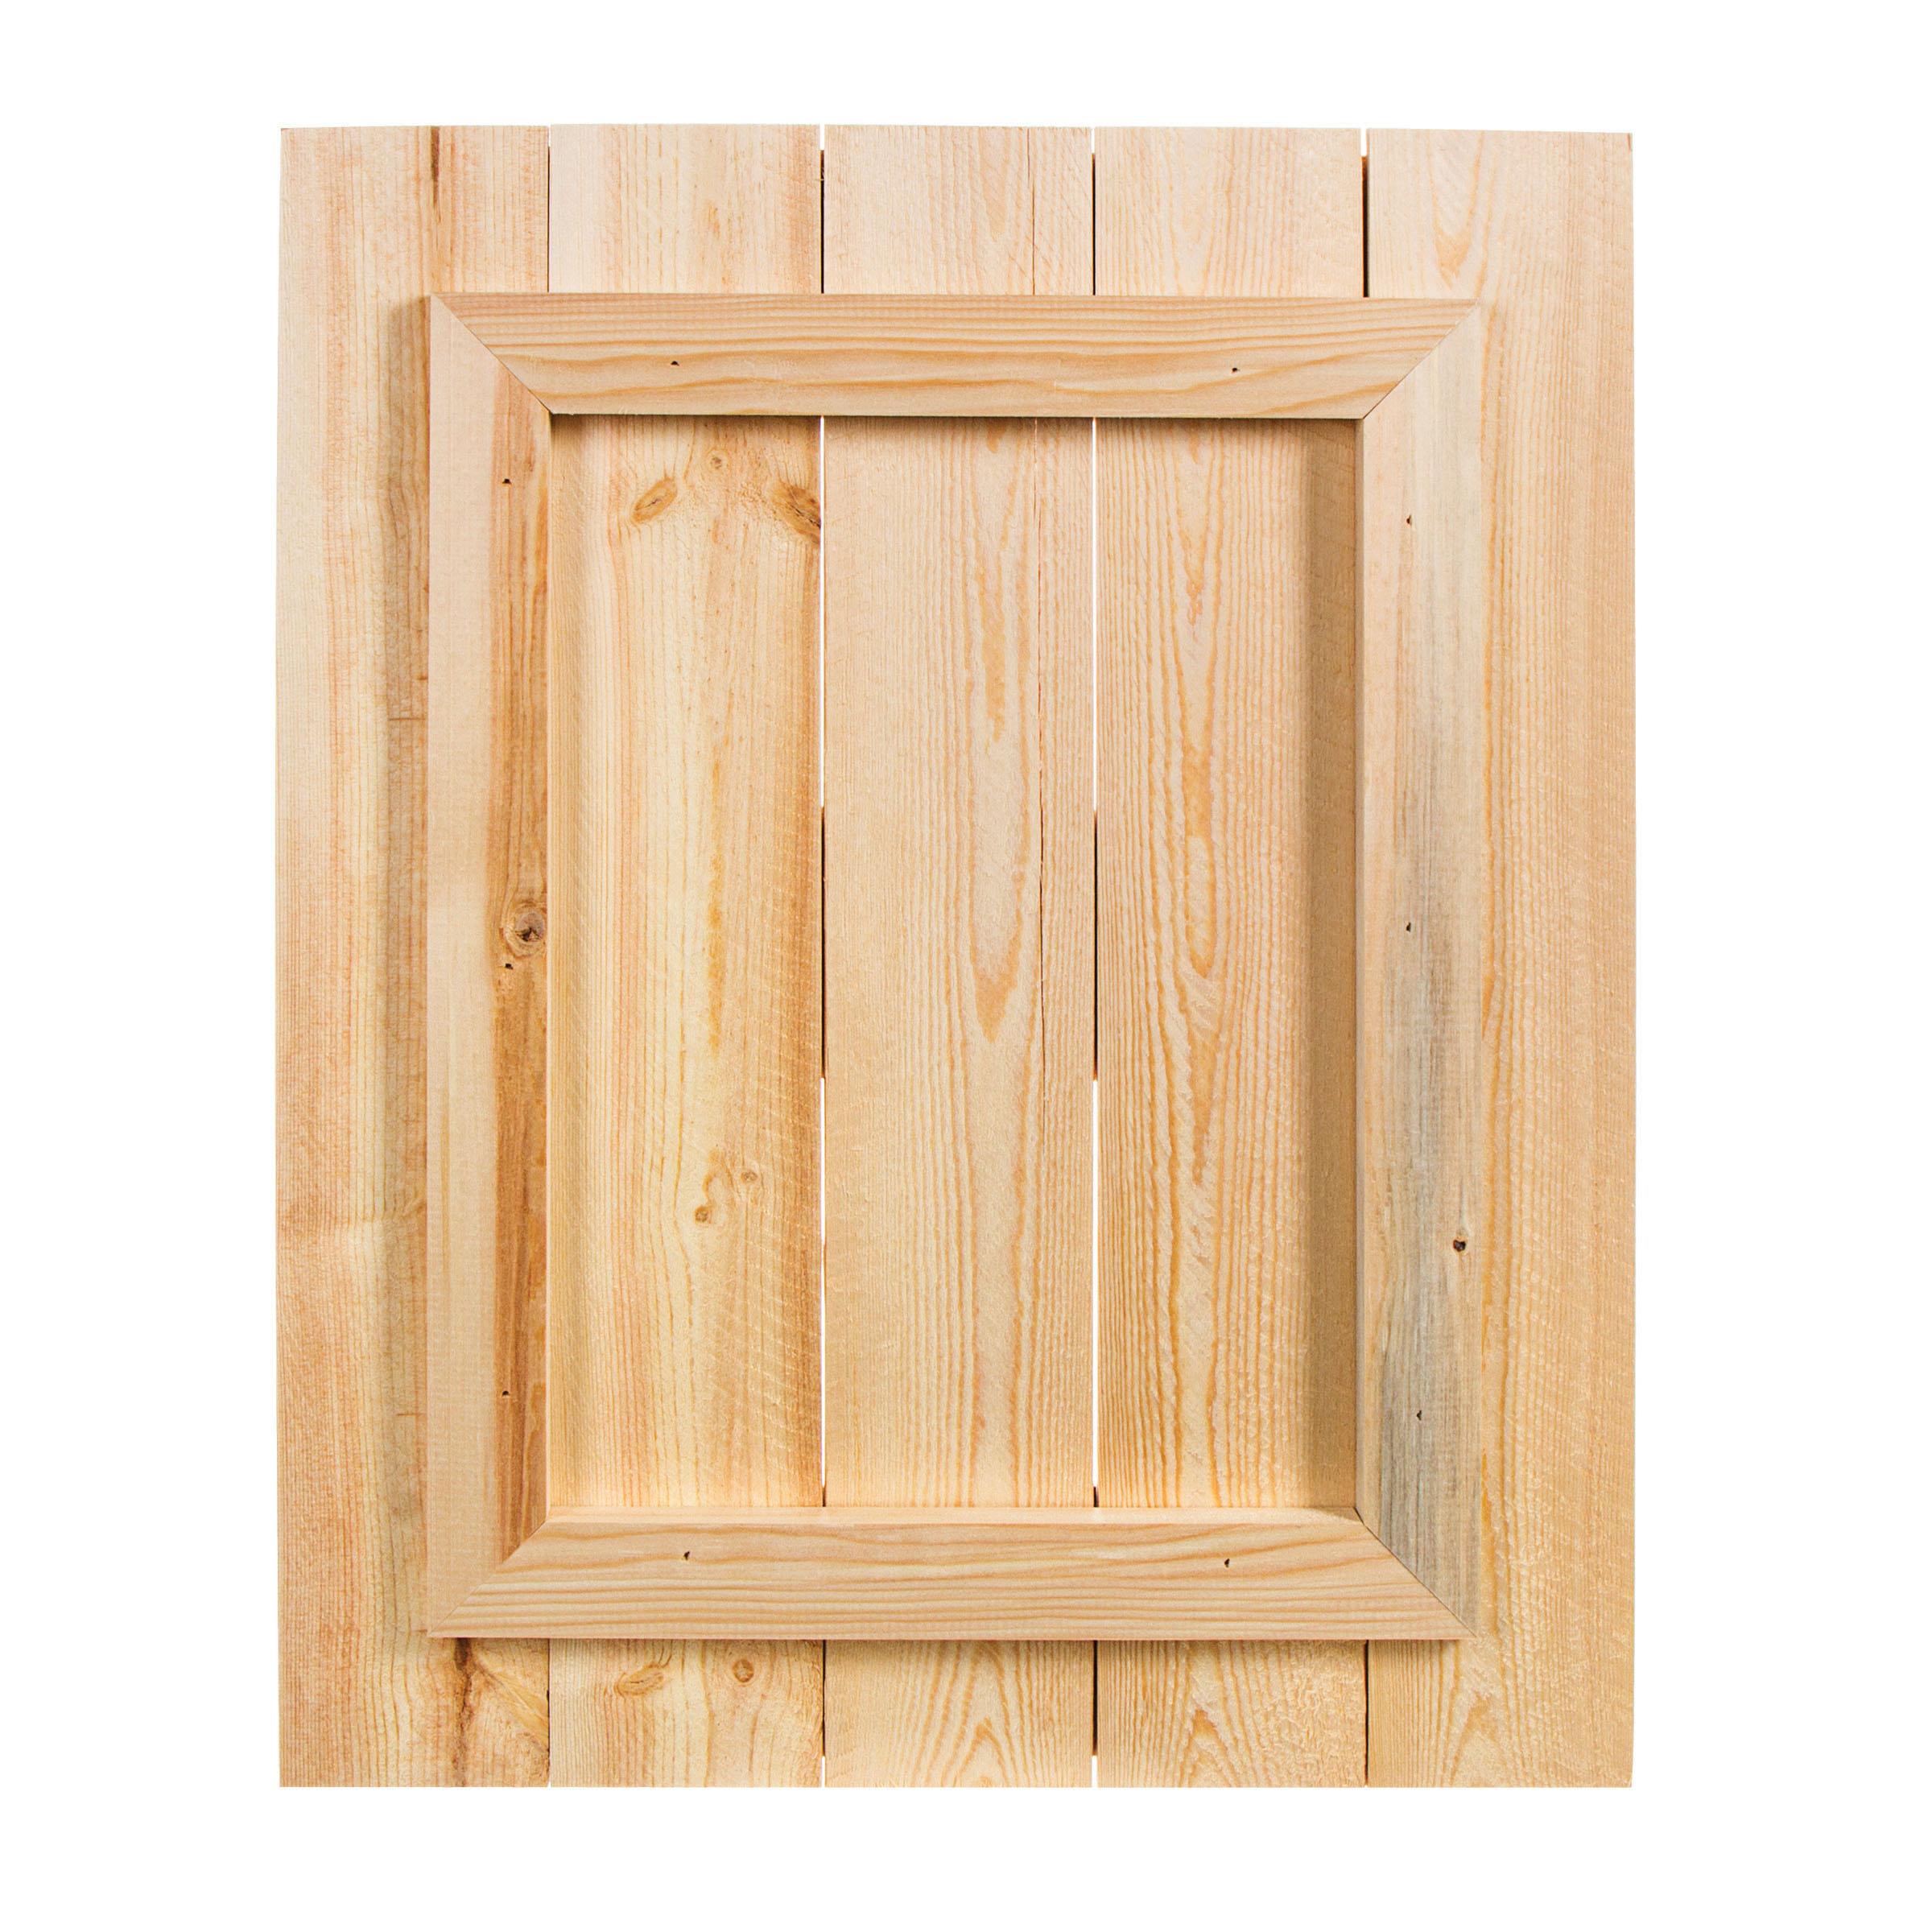 August Grove Wood Pallet Frame Wall Décor | Wayfair